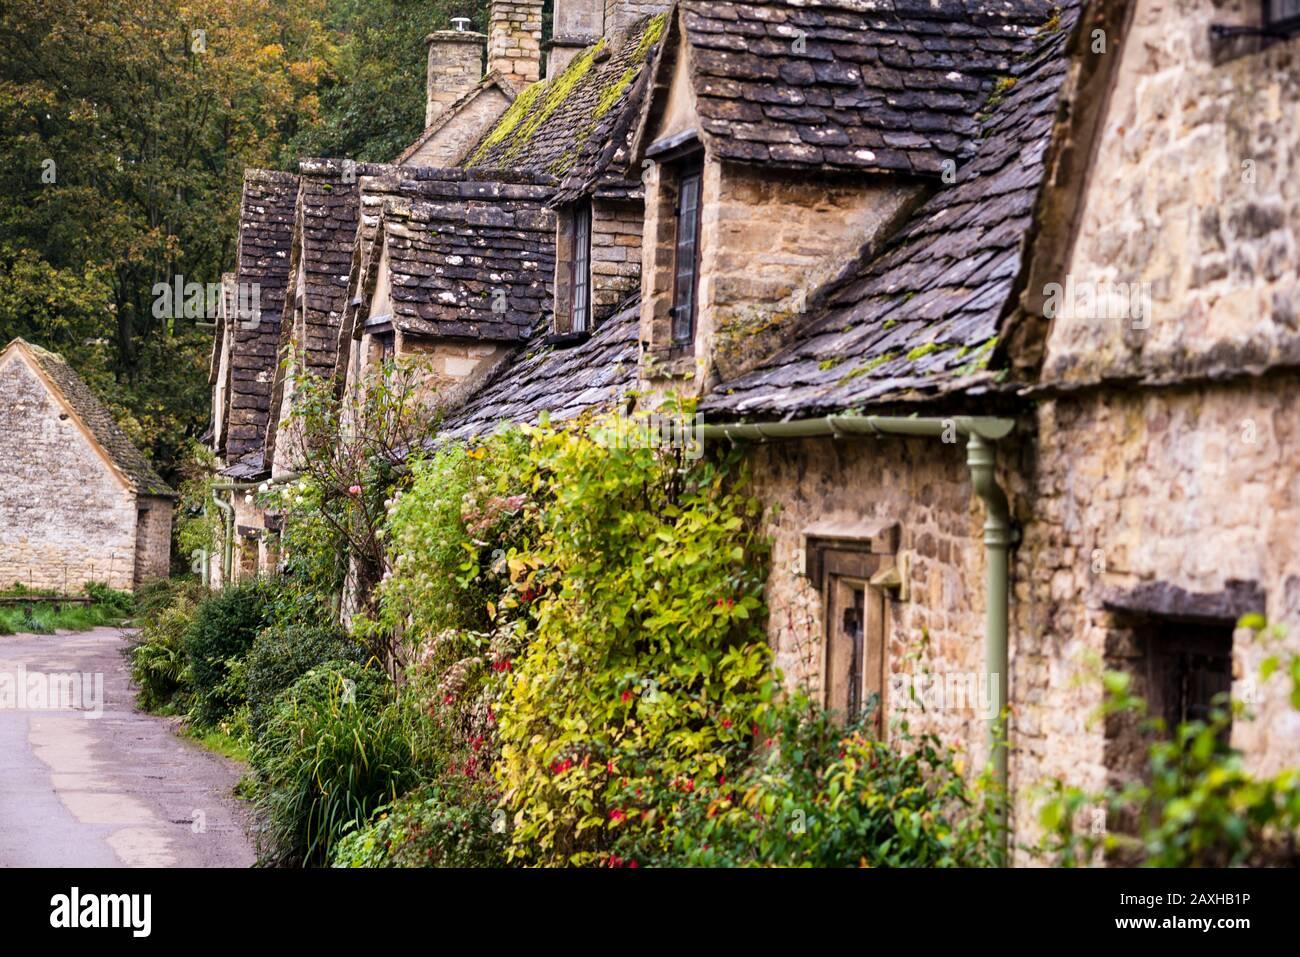 Arlington Row in Bibury, England are quaint 17th century stone cottages. Stock Photo